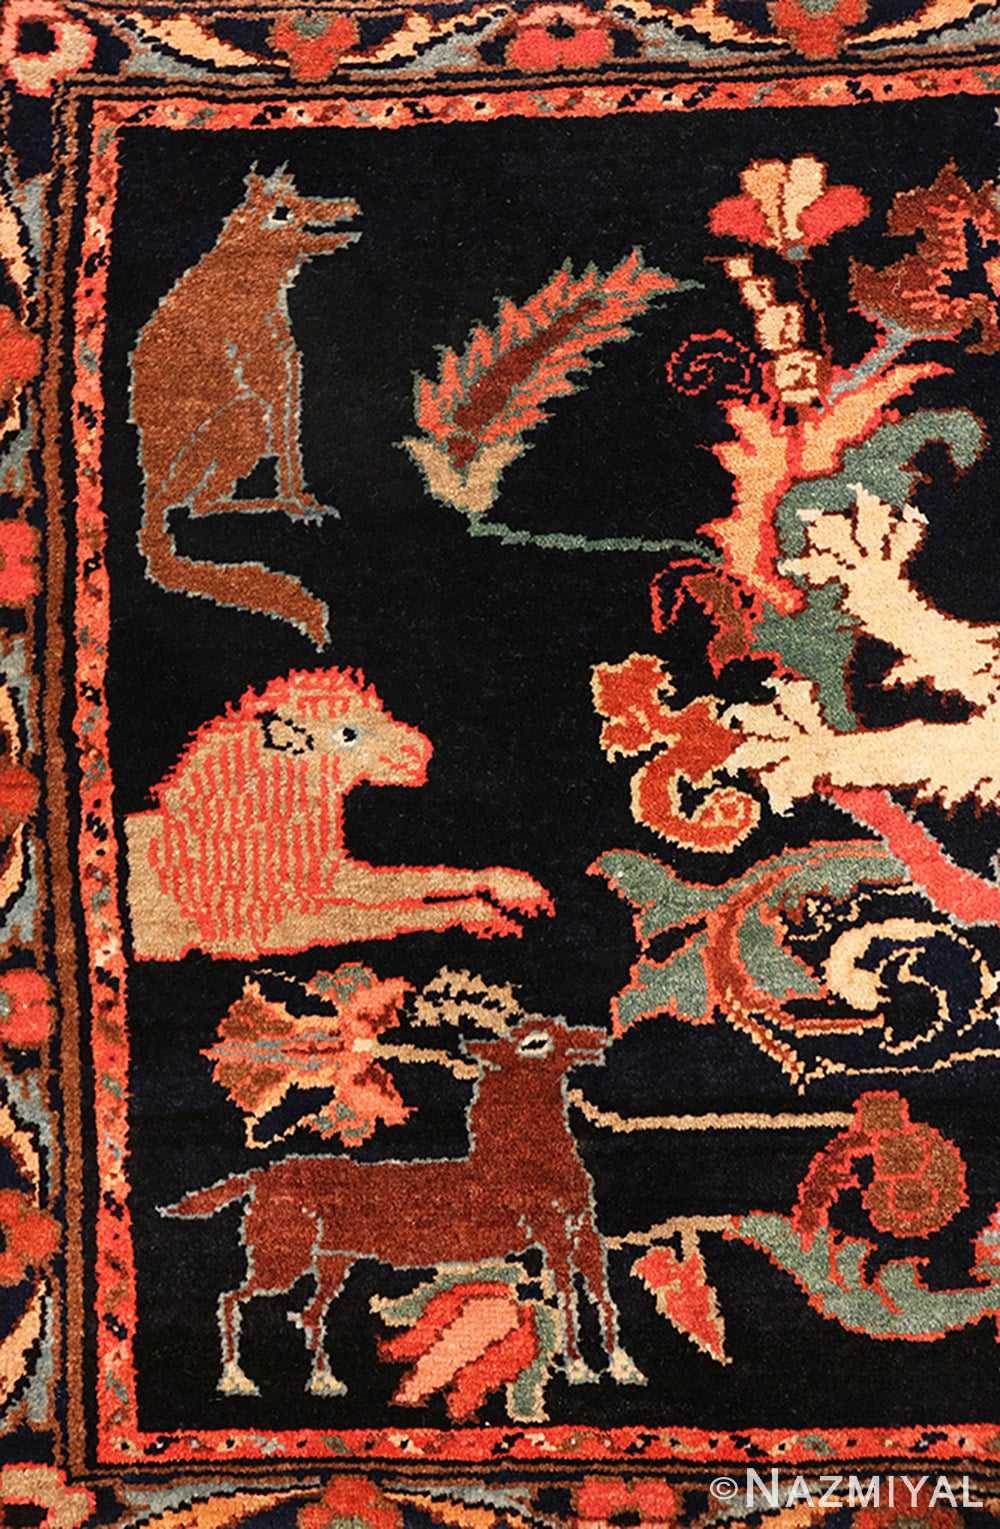 Animal Antique Persian Malayer Animal design rug 70131 by Nazmiyal